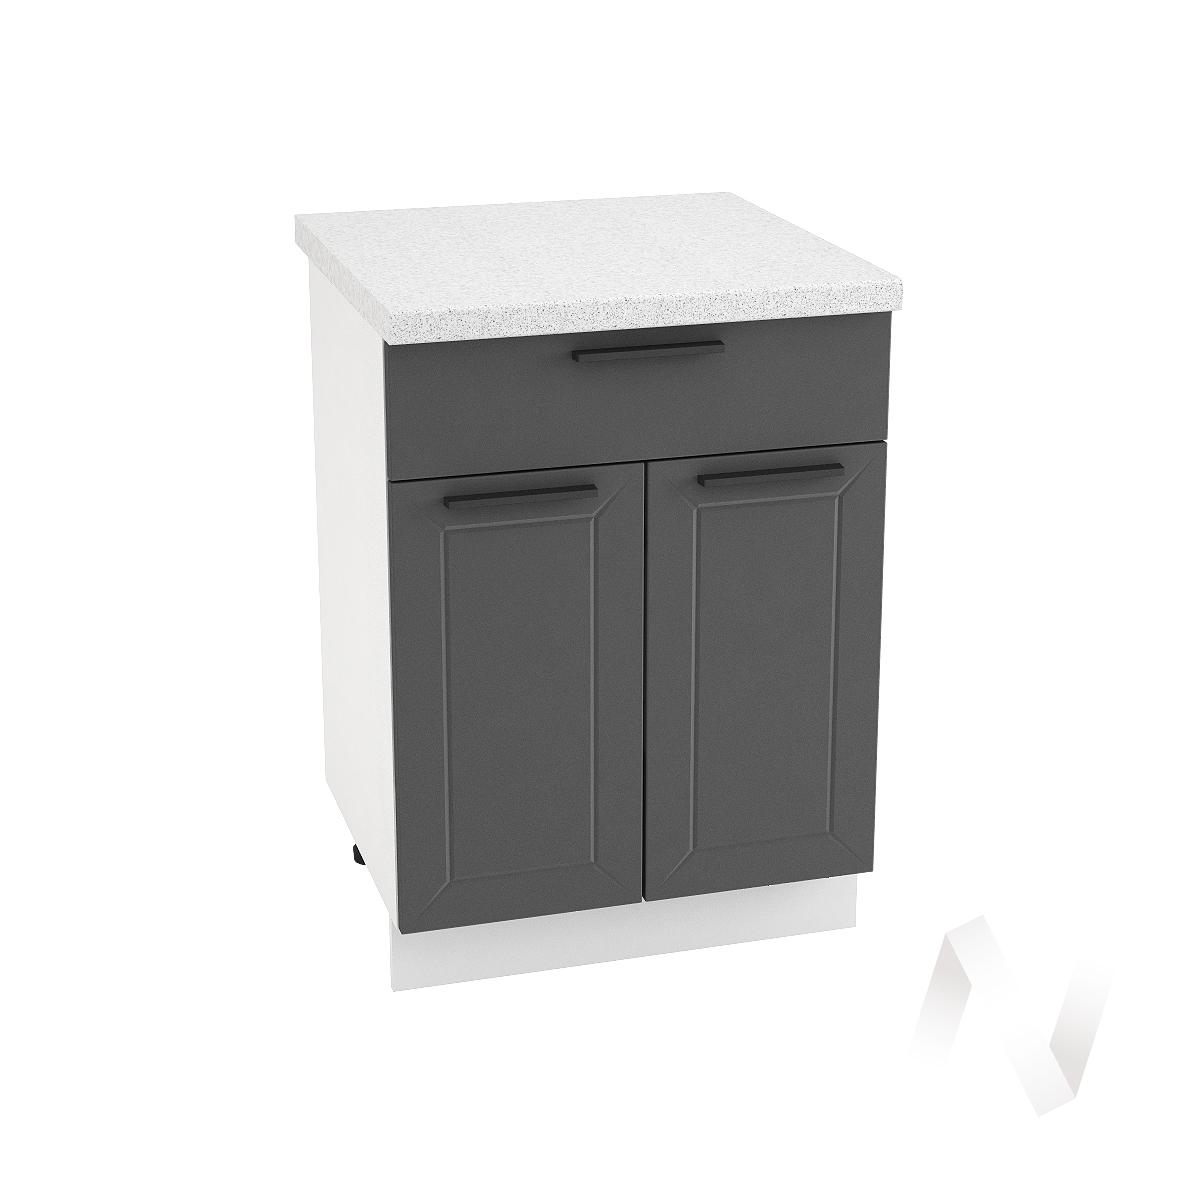 "Кухня ""Глетчер"": Шкаф нижний с ящиком 600, ШН1Я 600 М (Маренго силк/корпус белый)"